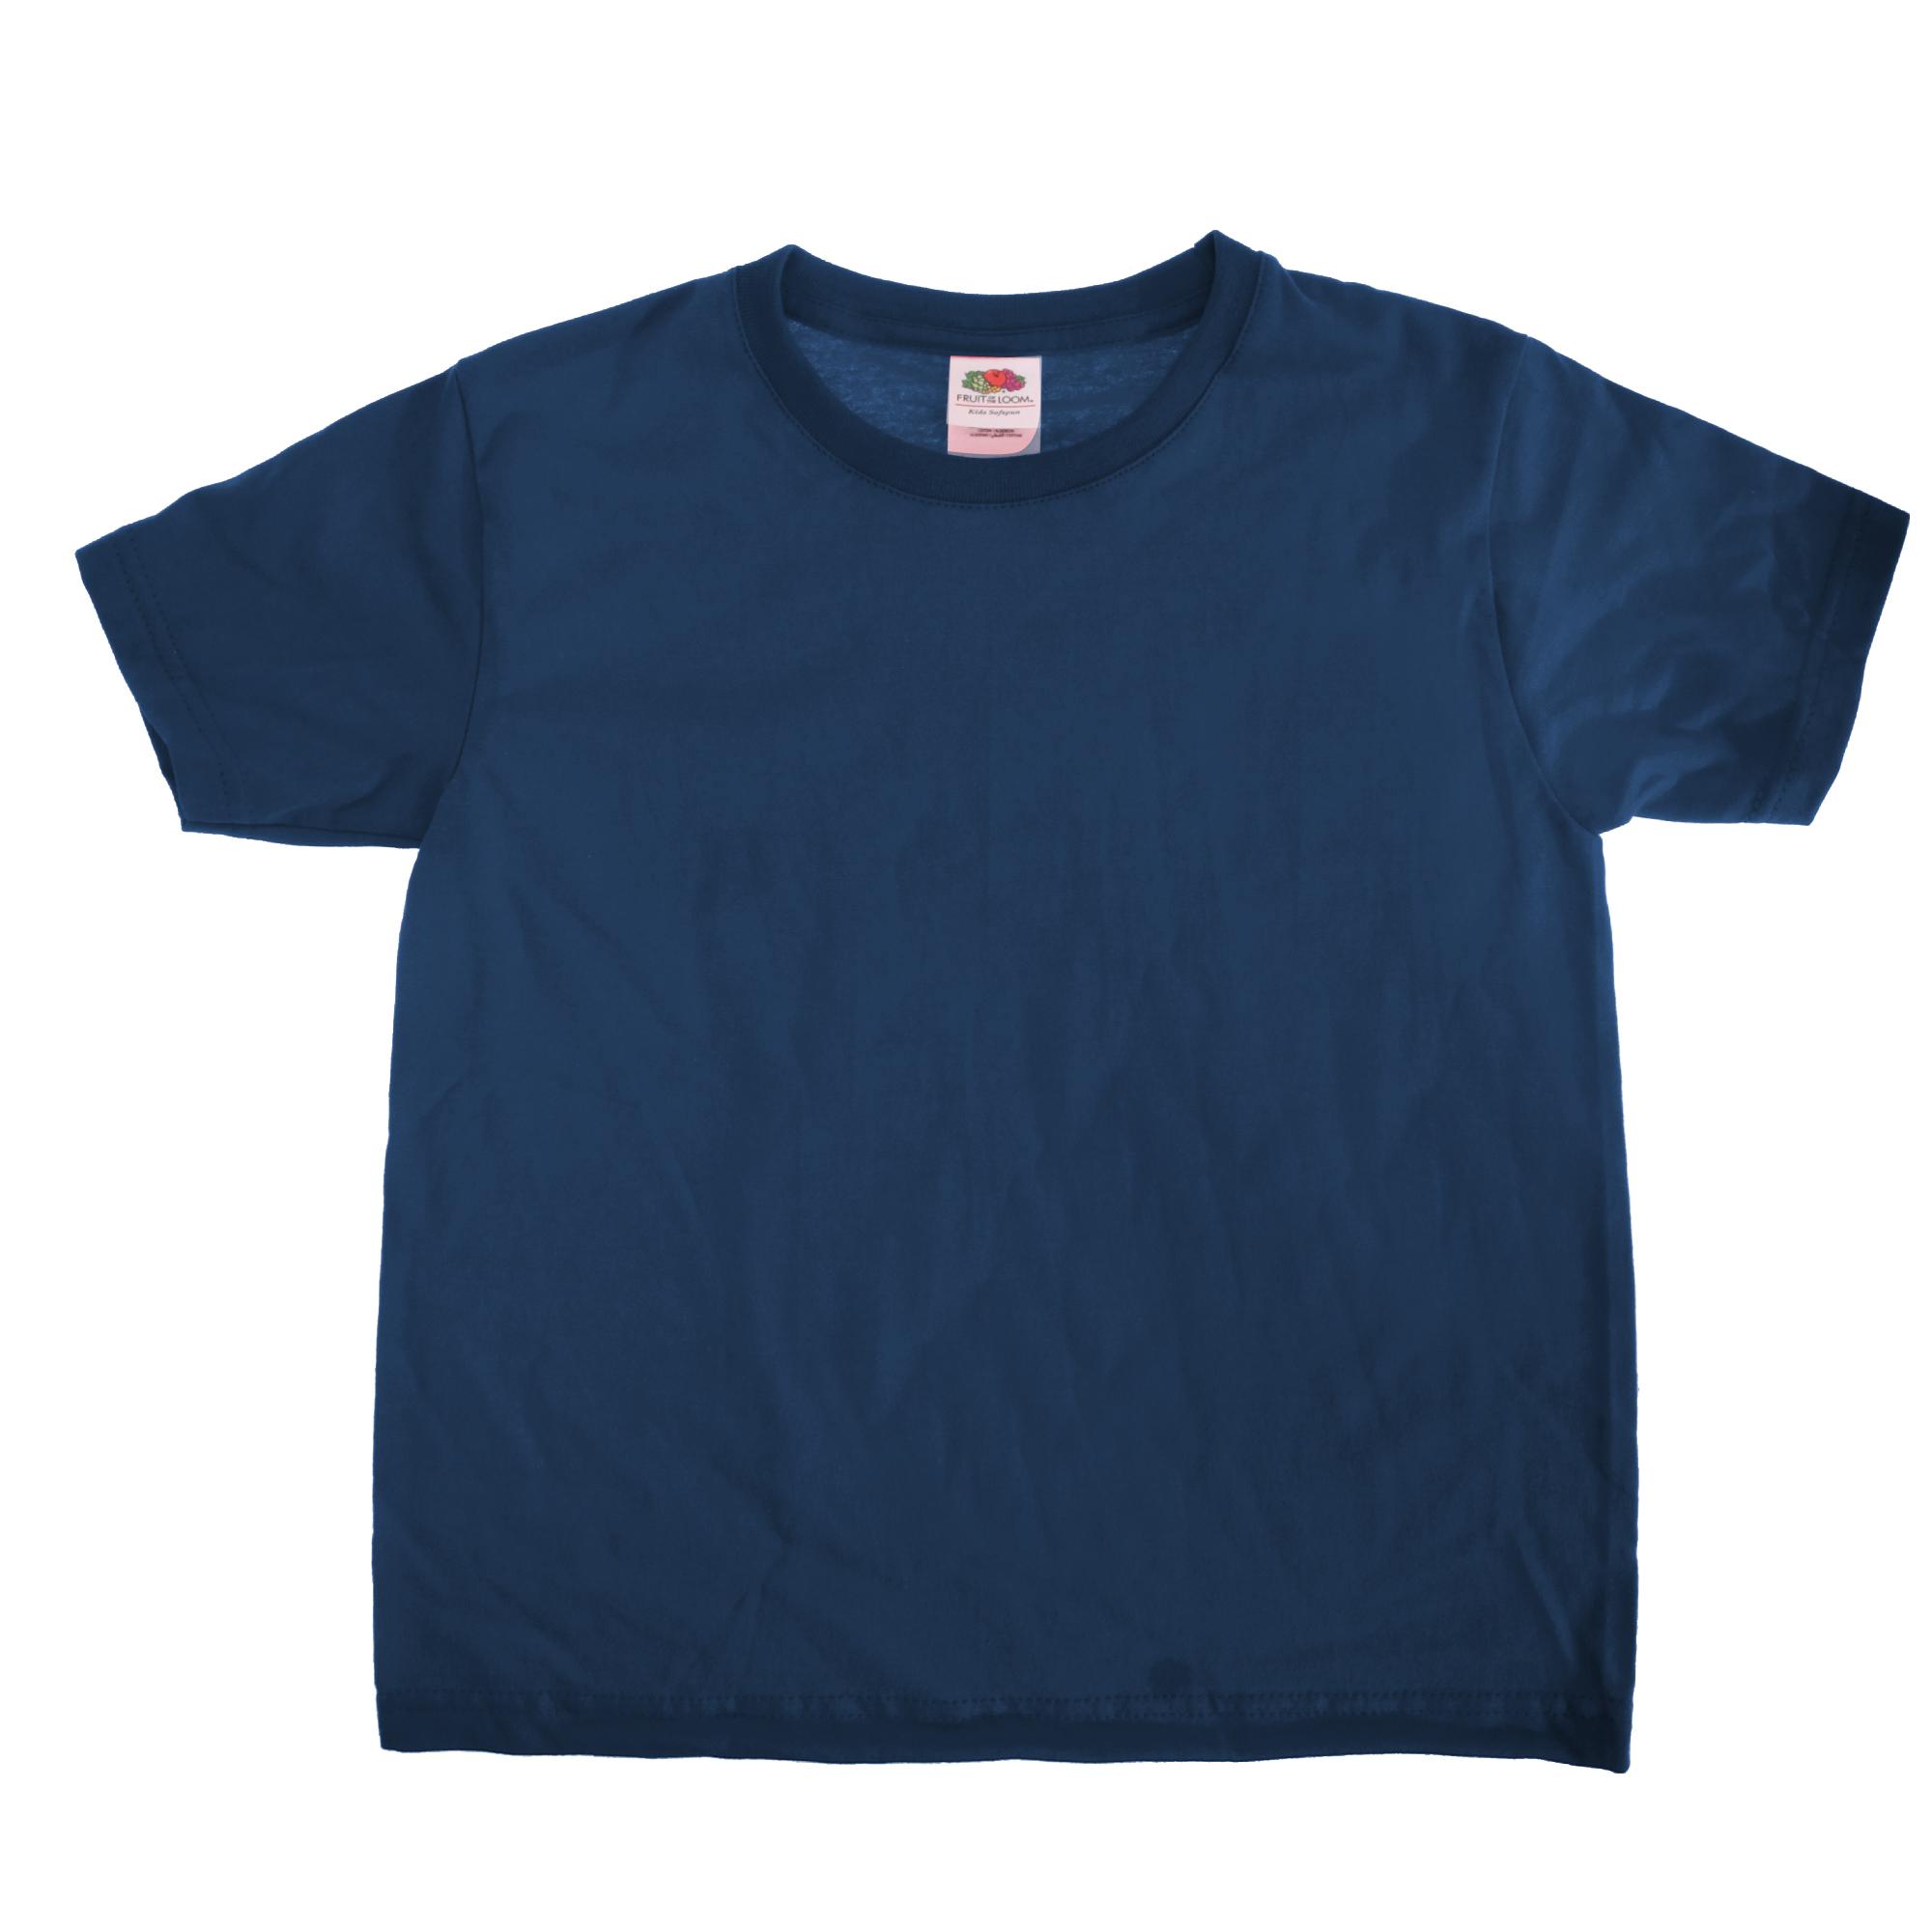 Fruit-Of-The-Loom-Kids-Sofspun-Short-Sleeve-T-Shirt-Pack-of-2-BC4273 thumbnail 20